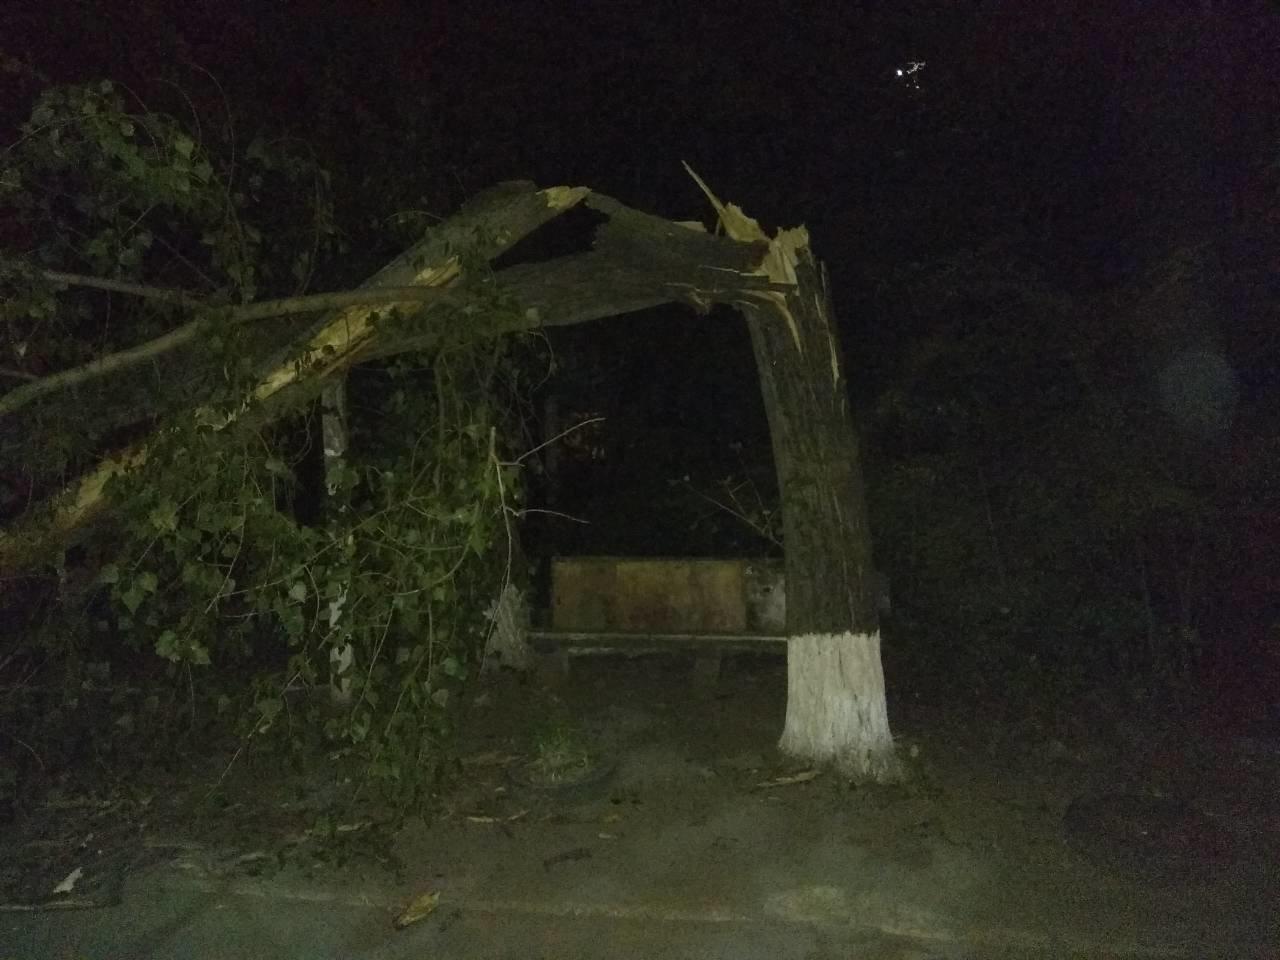 В Мариуполе на автомобиль упало дерево, - ФОТО, фото-1